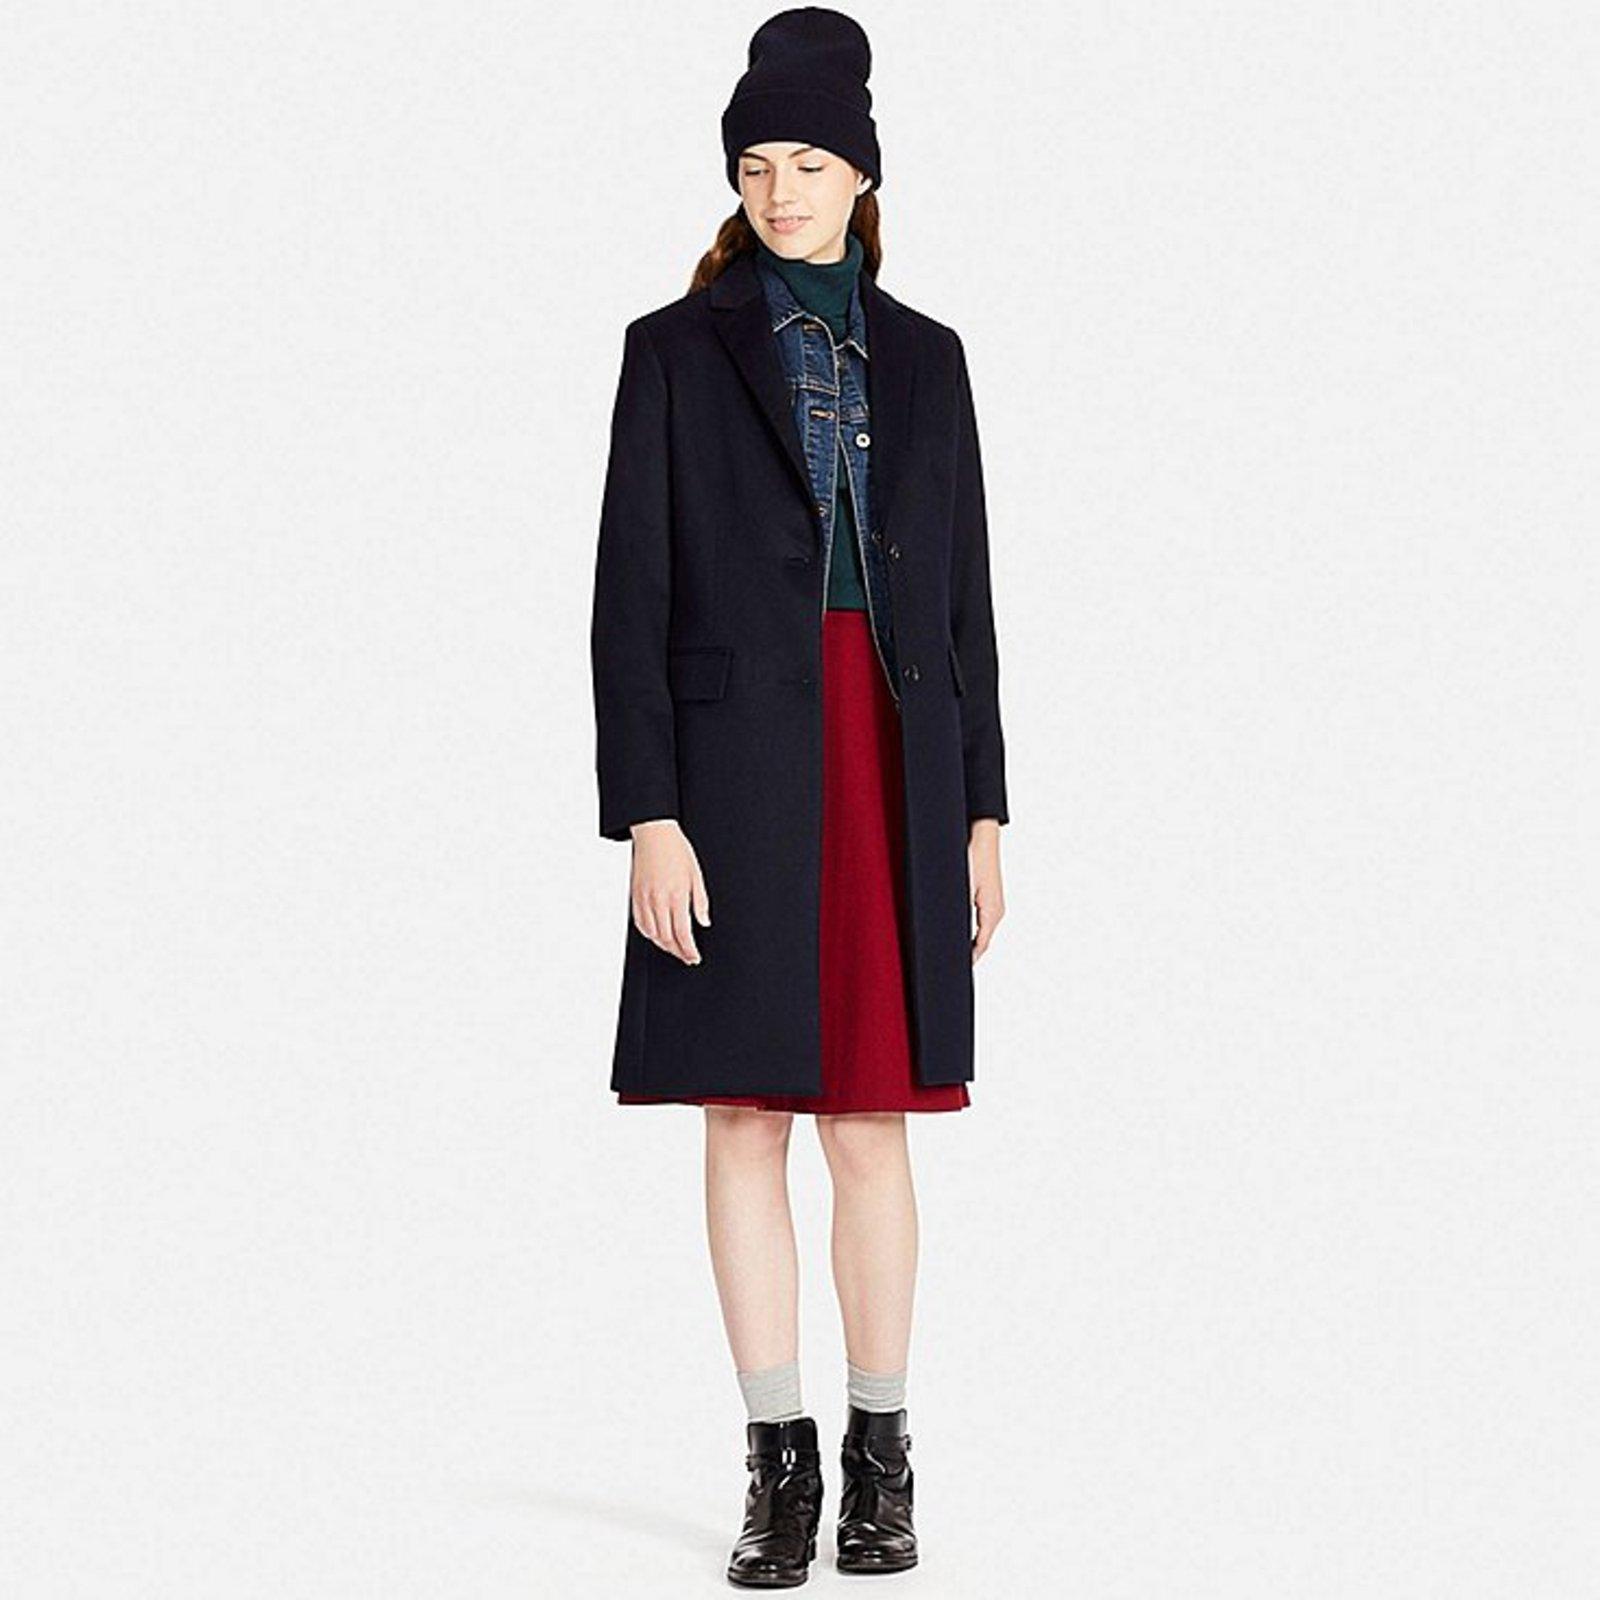 Manteau cachemire femme uniqlo